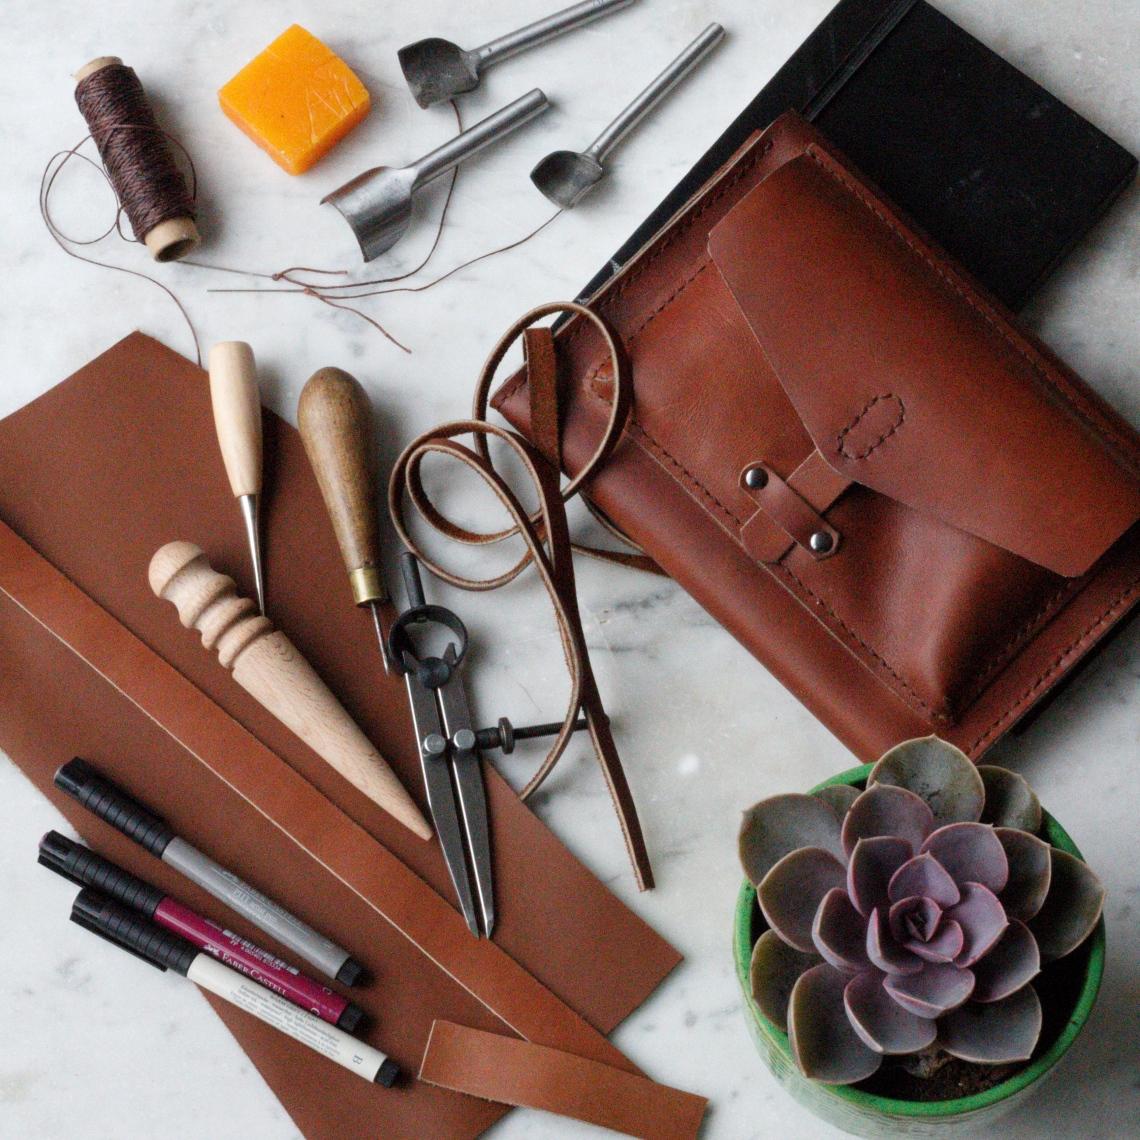 leather moleskin artpad wallet handmade by Ink Sugar Spice